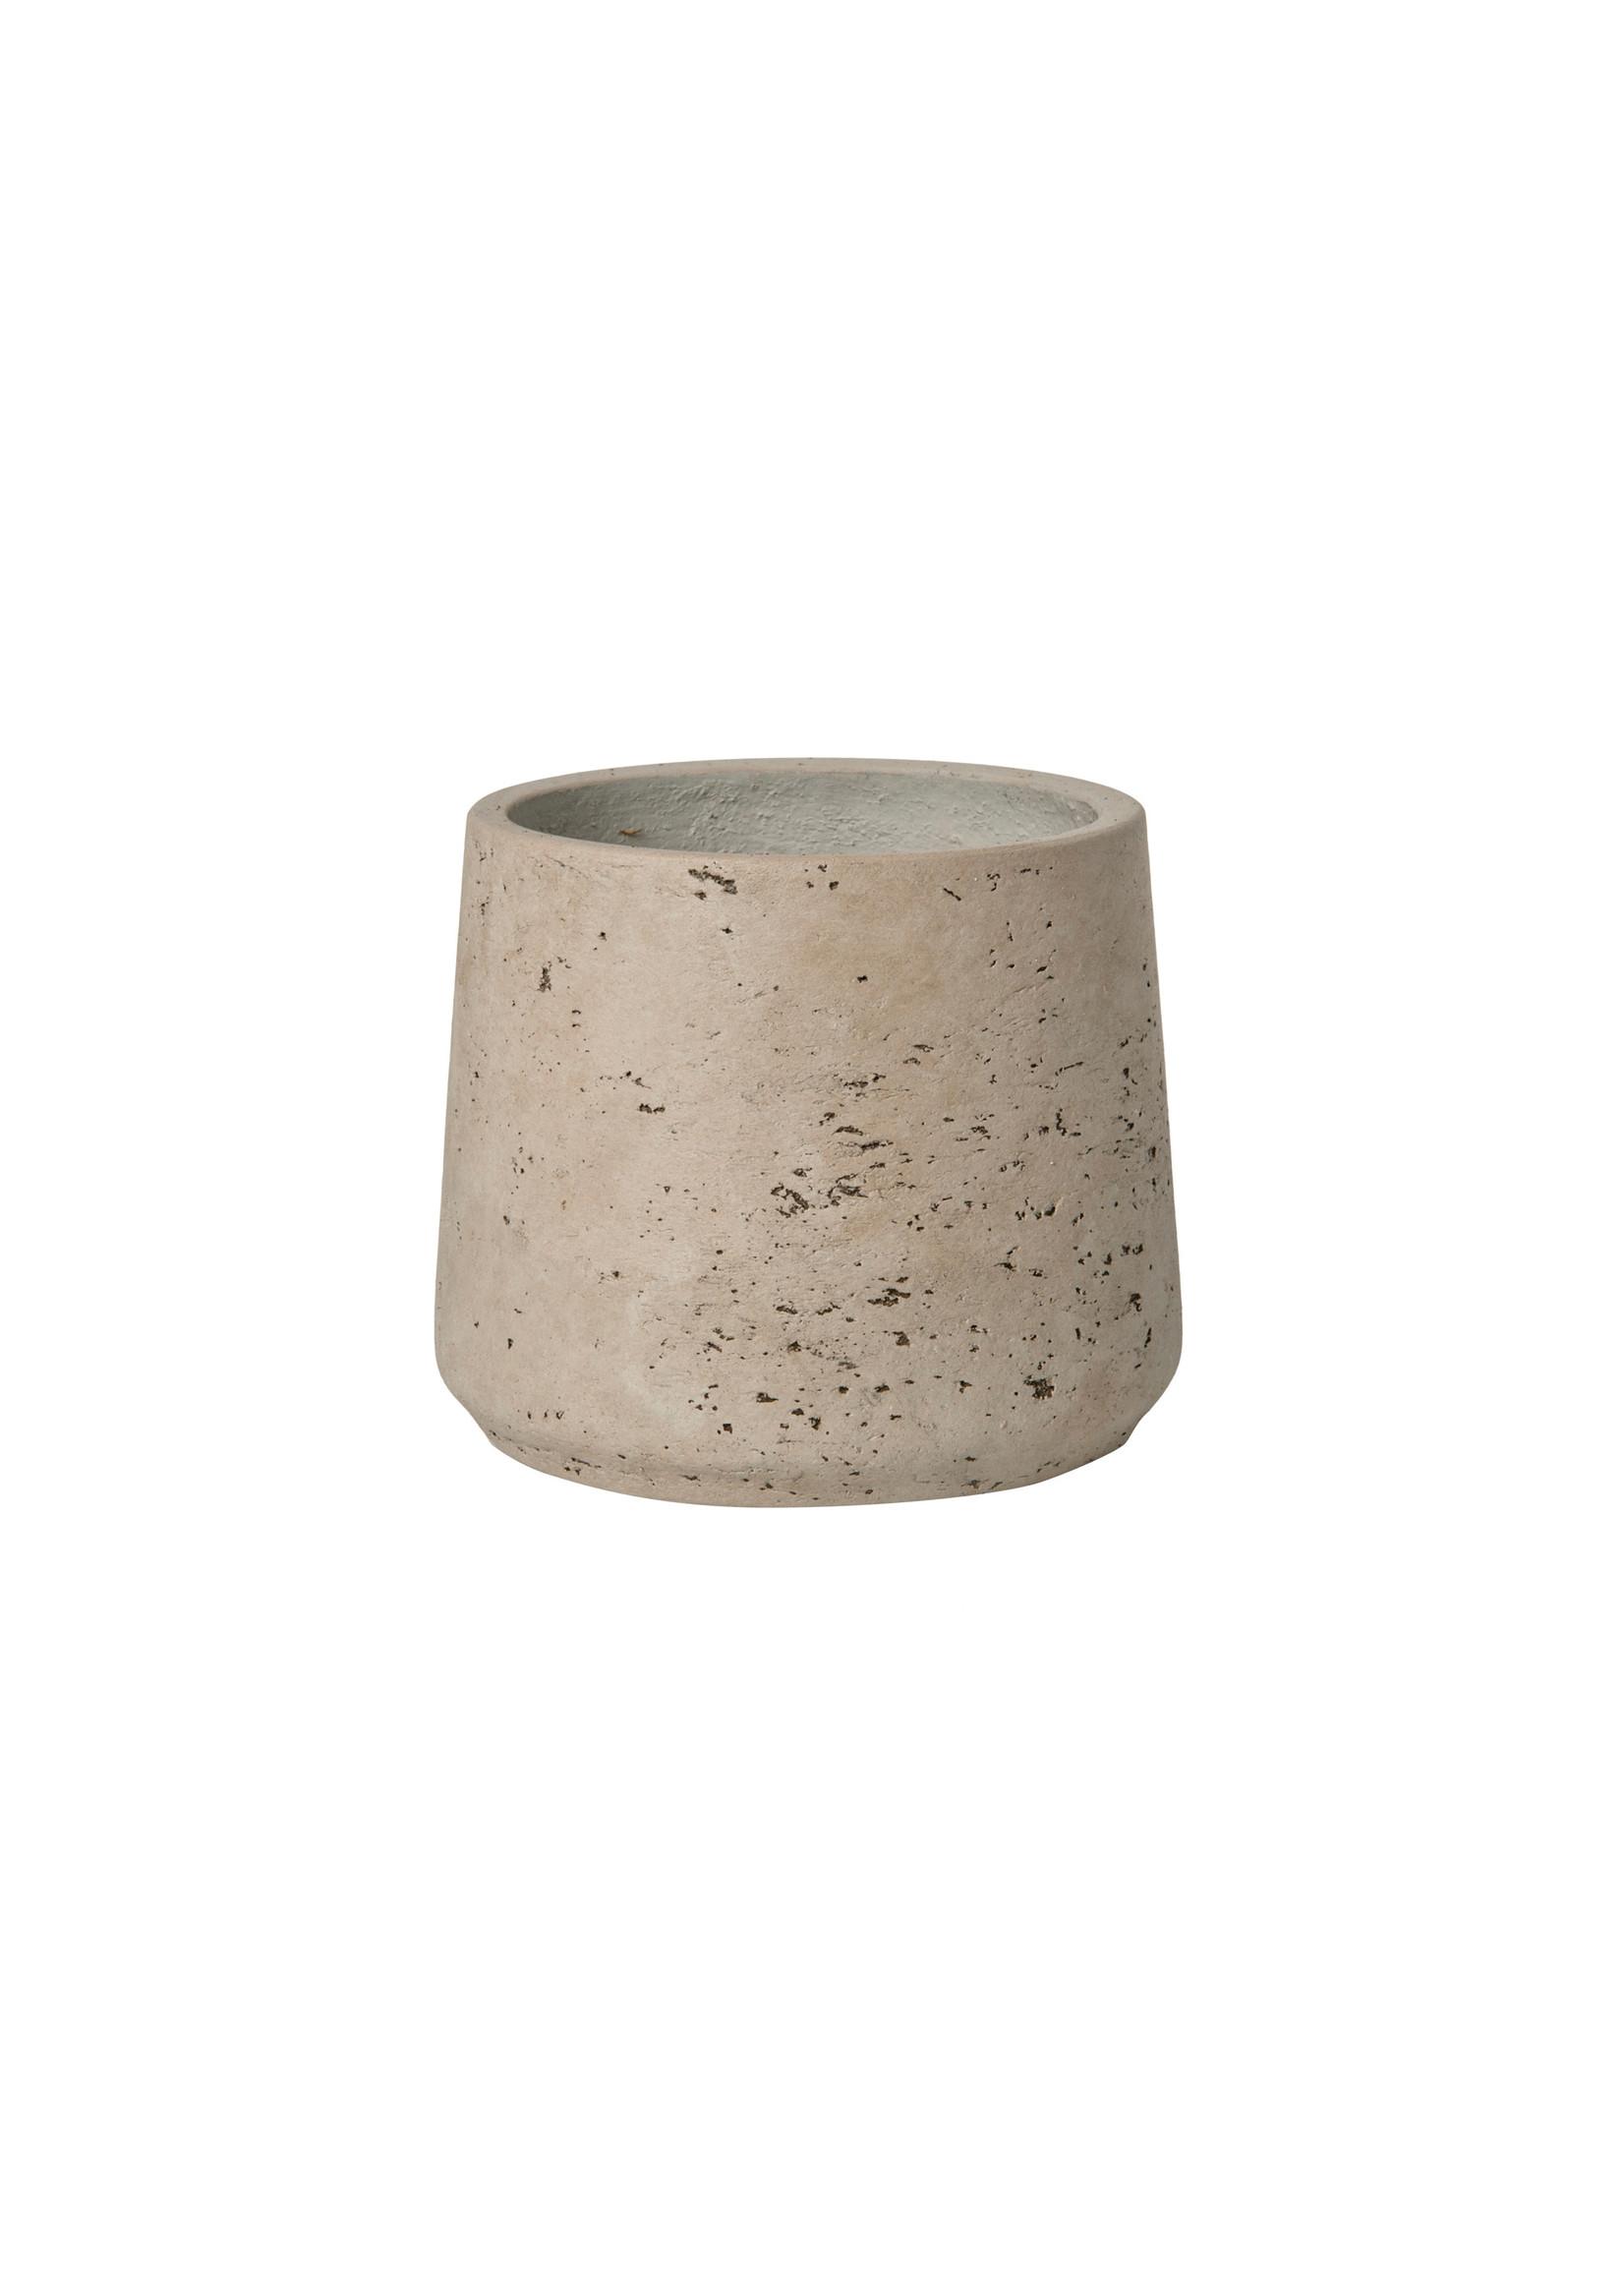 Potterypots Patt M Grey Washed